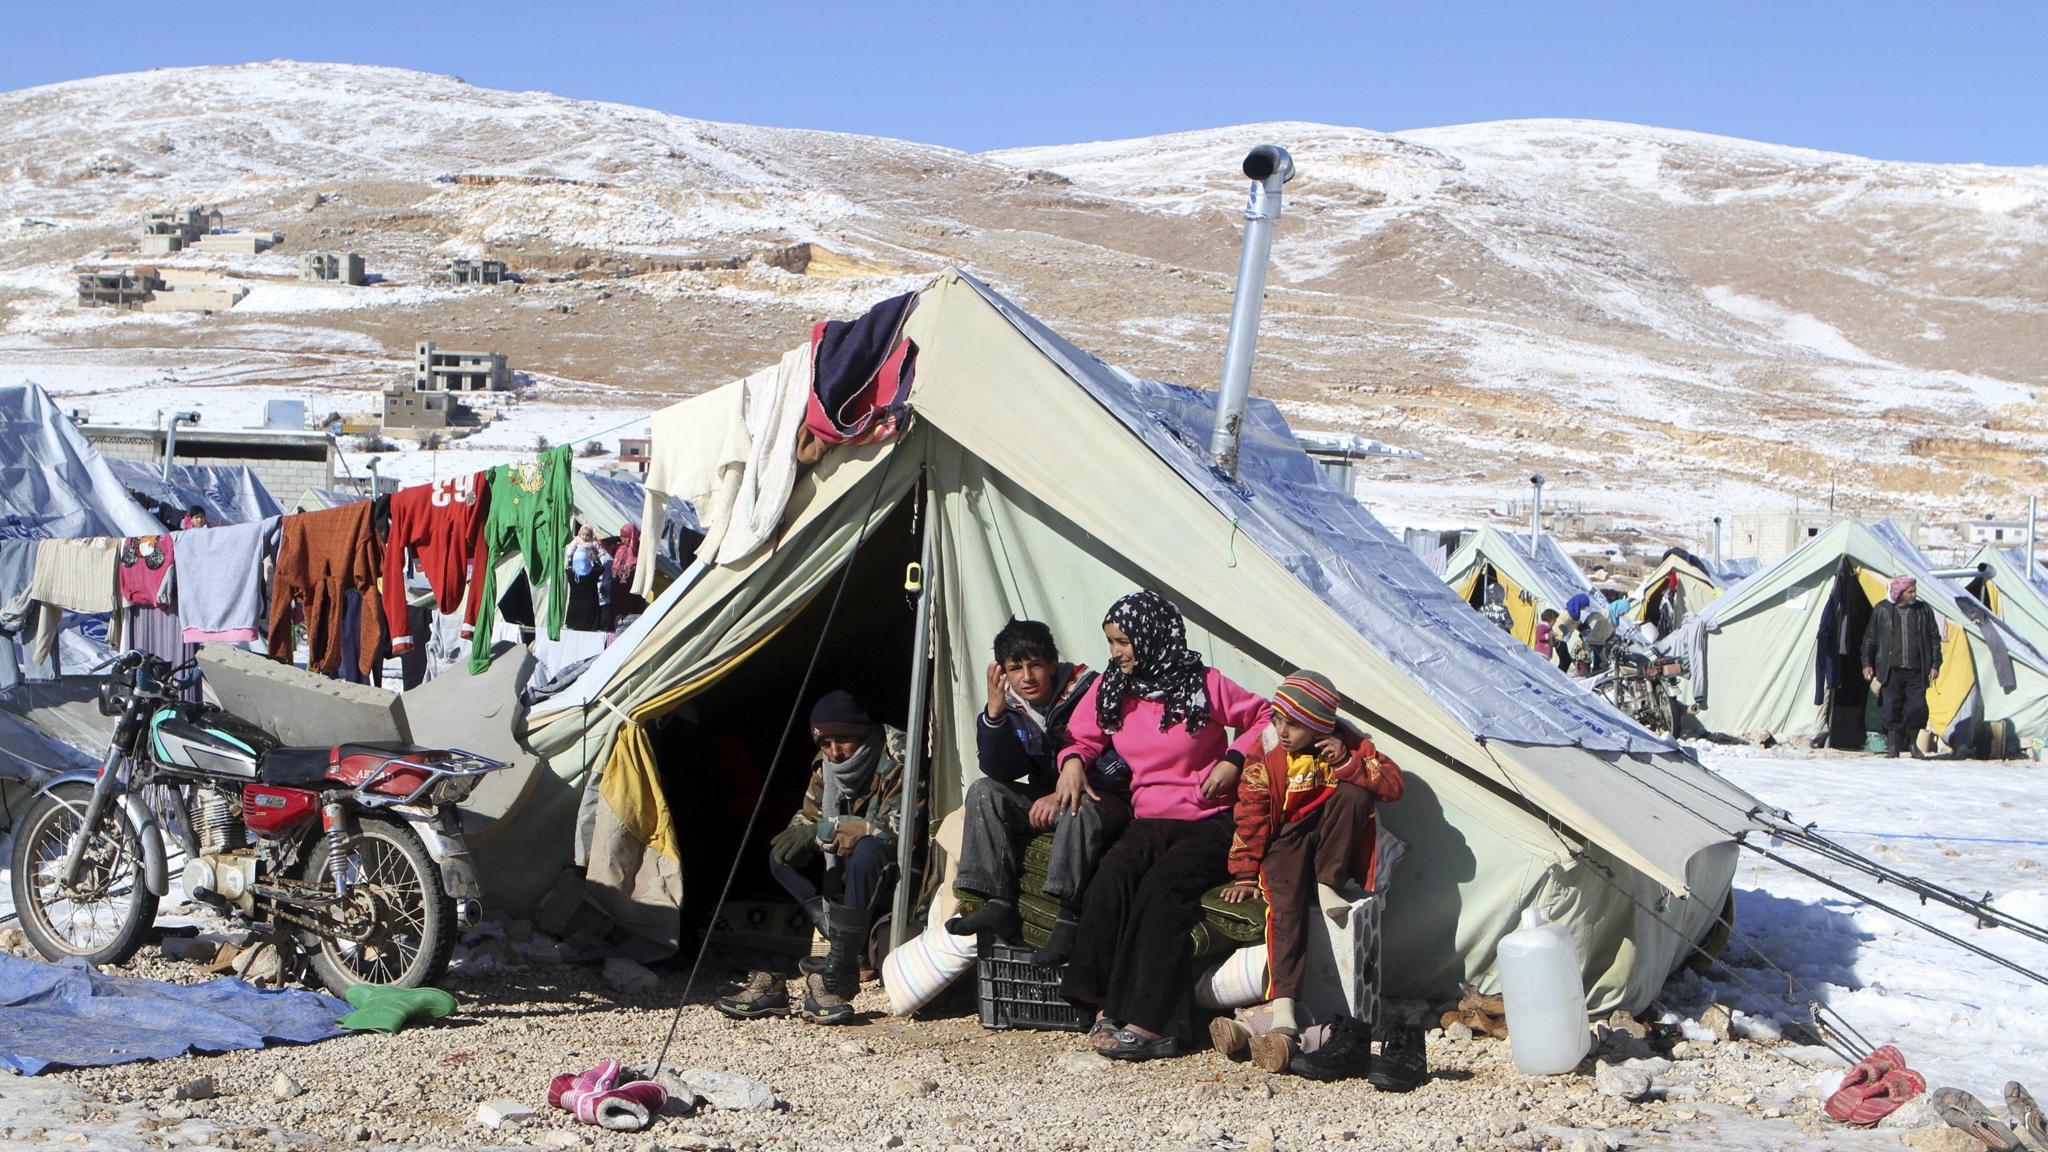 Syrian refugees suffering on Lebanese border